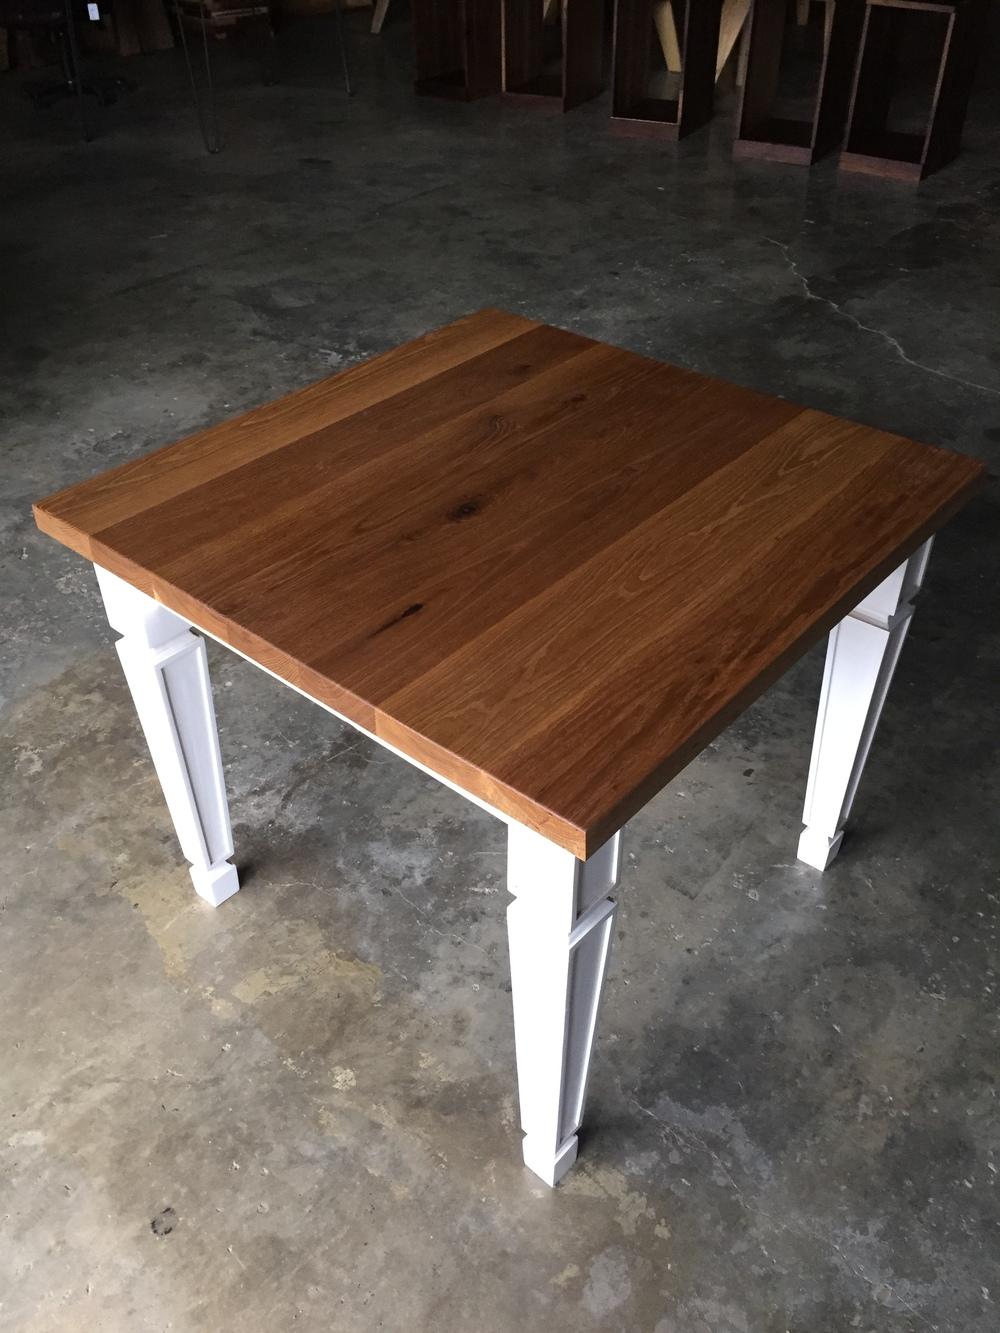 Aged White Oak Table